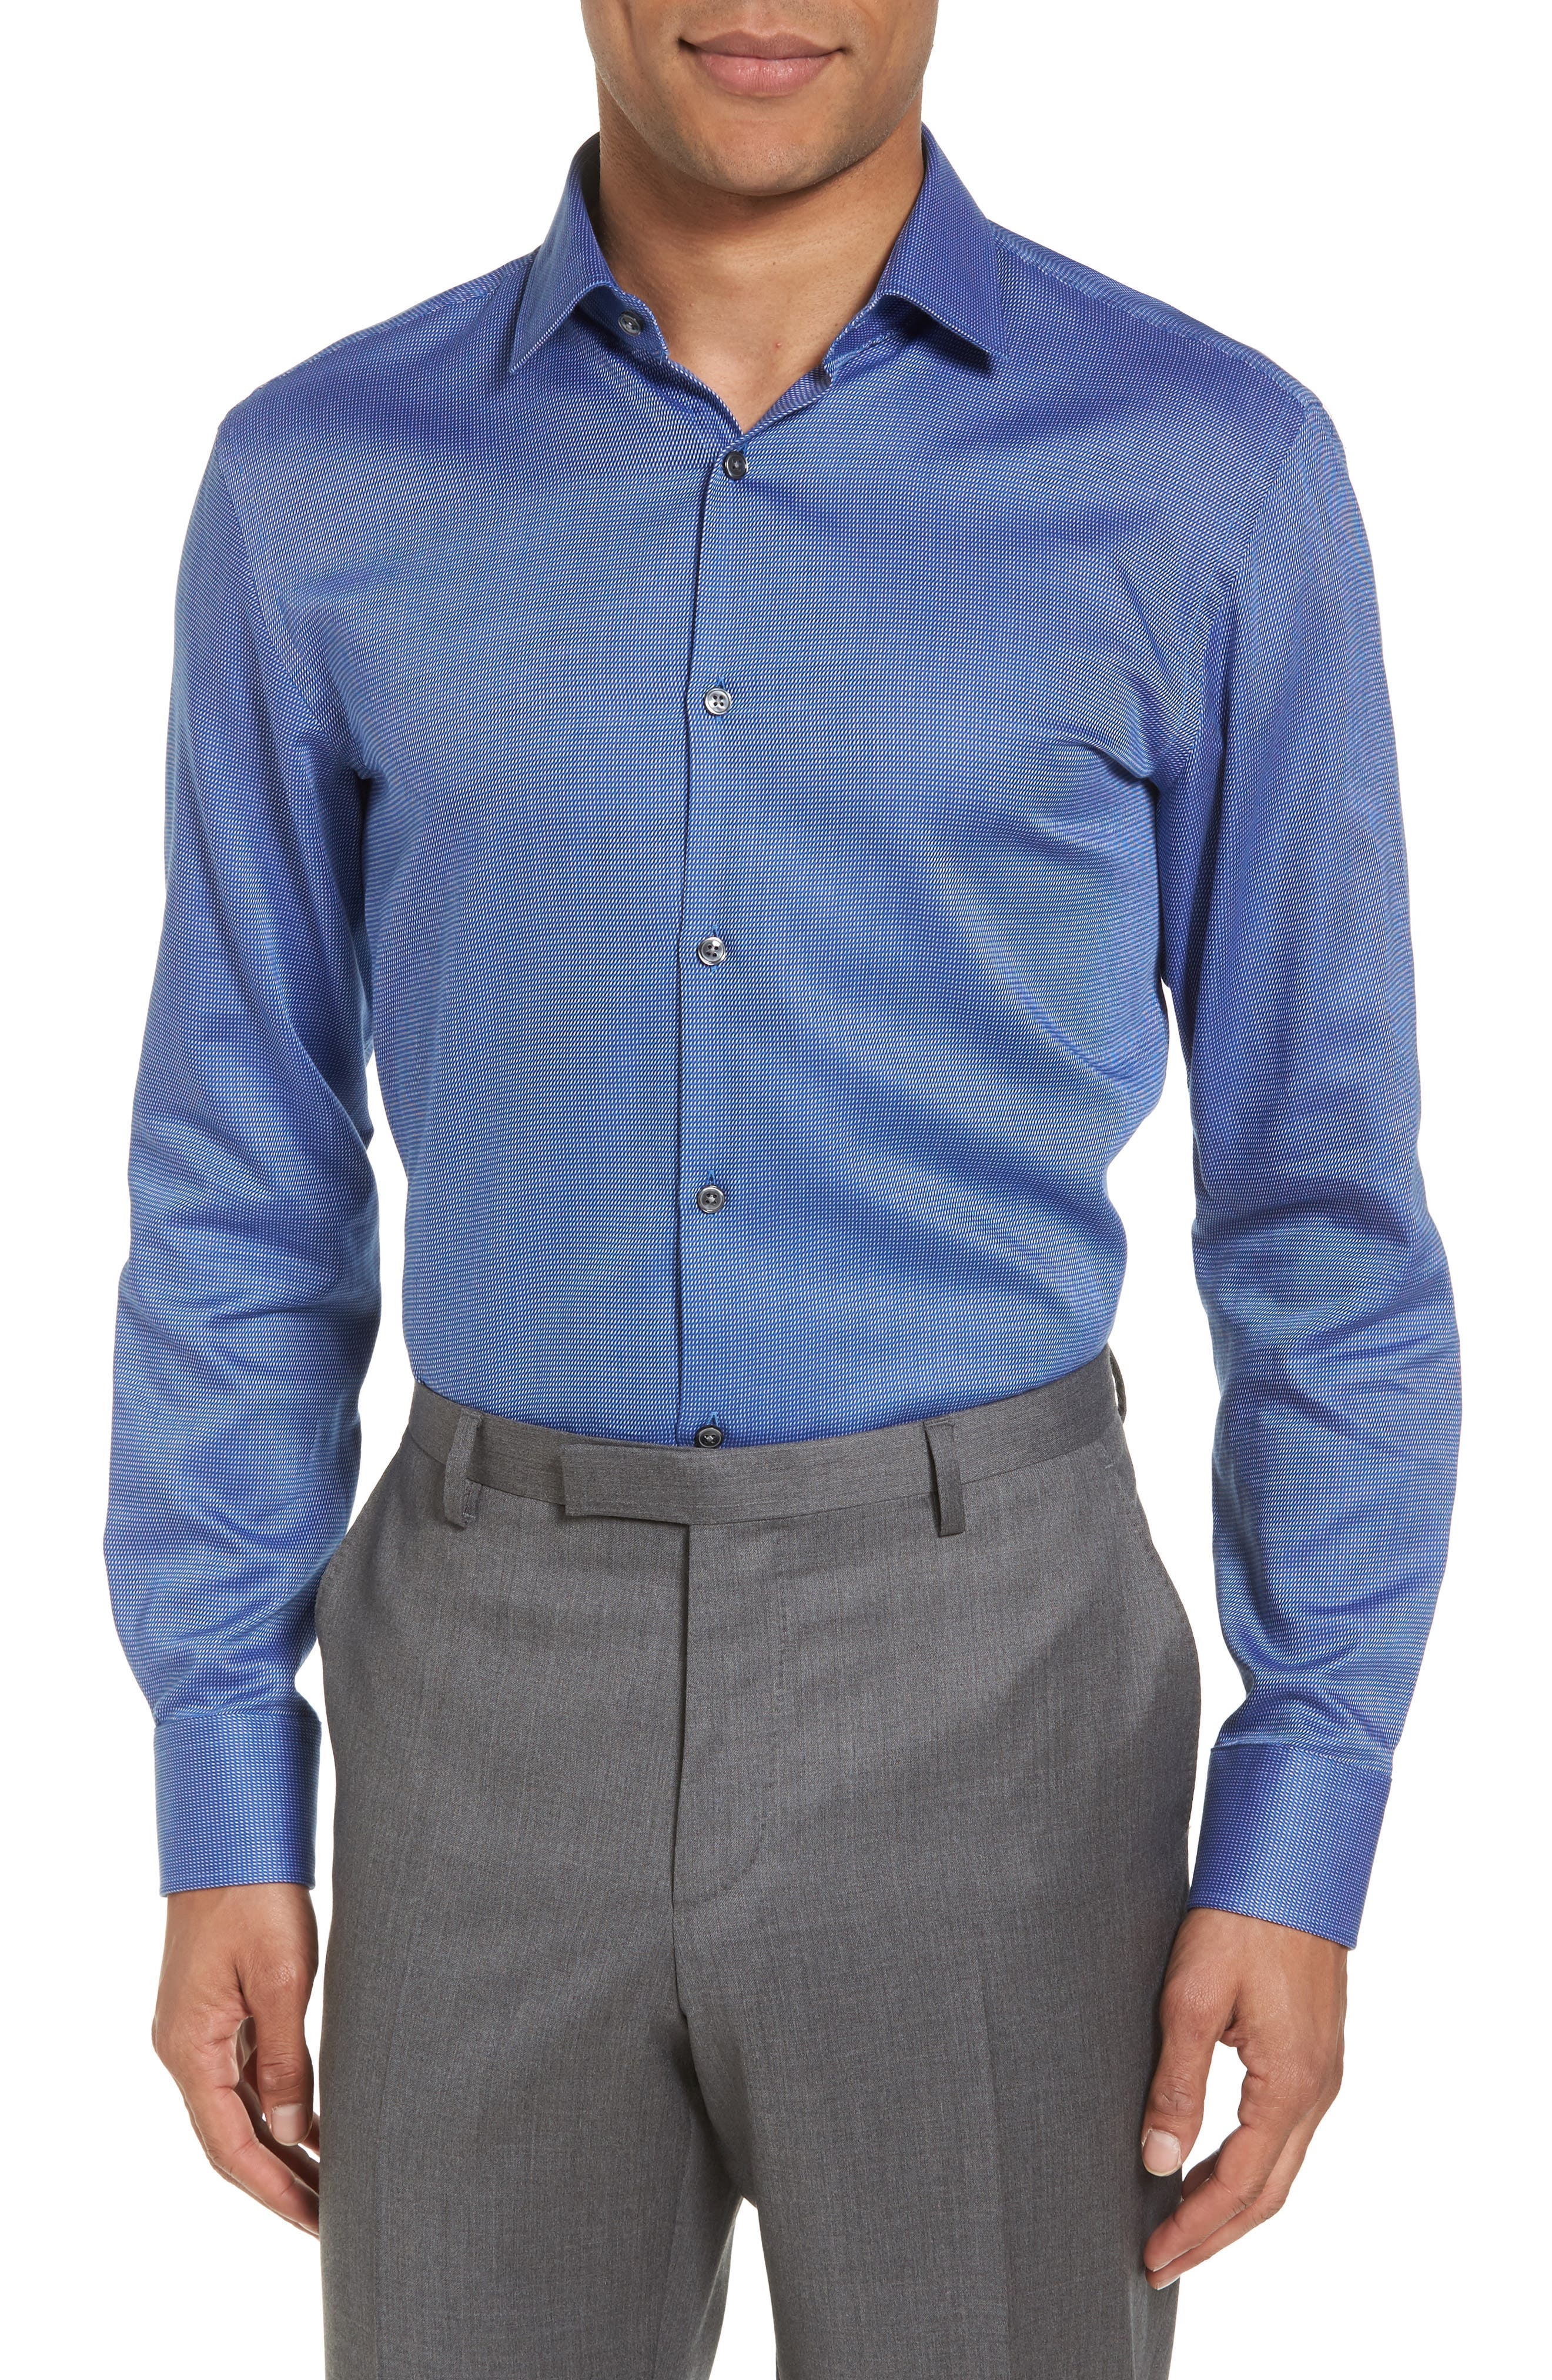 Sharp Fit Solid Dress Shirt,                         Main,                         color, 410